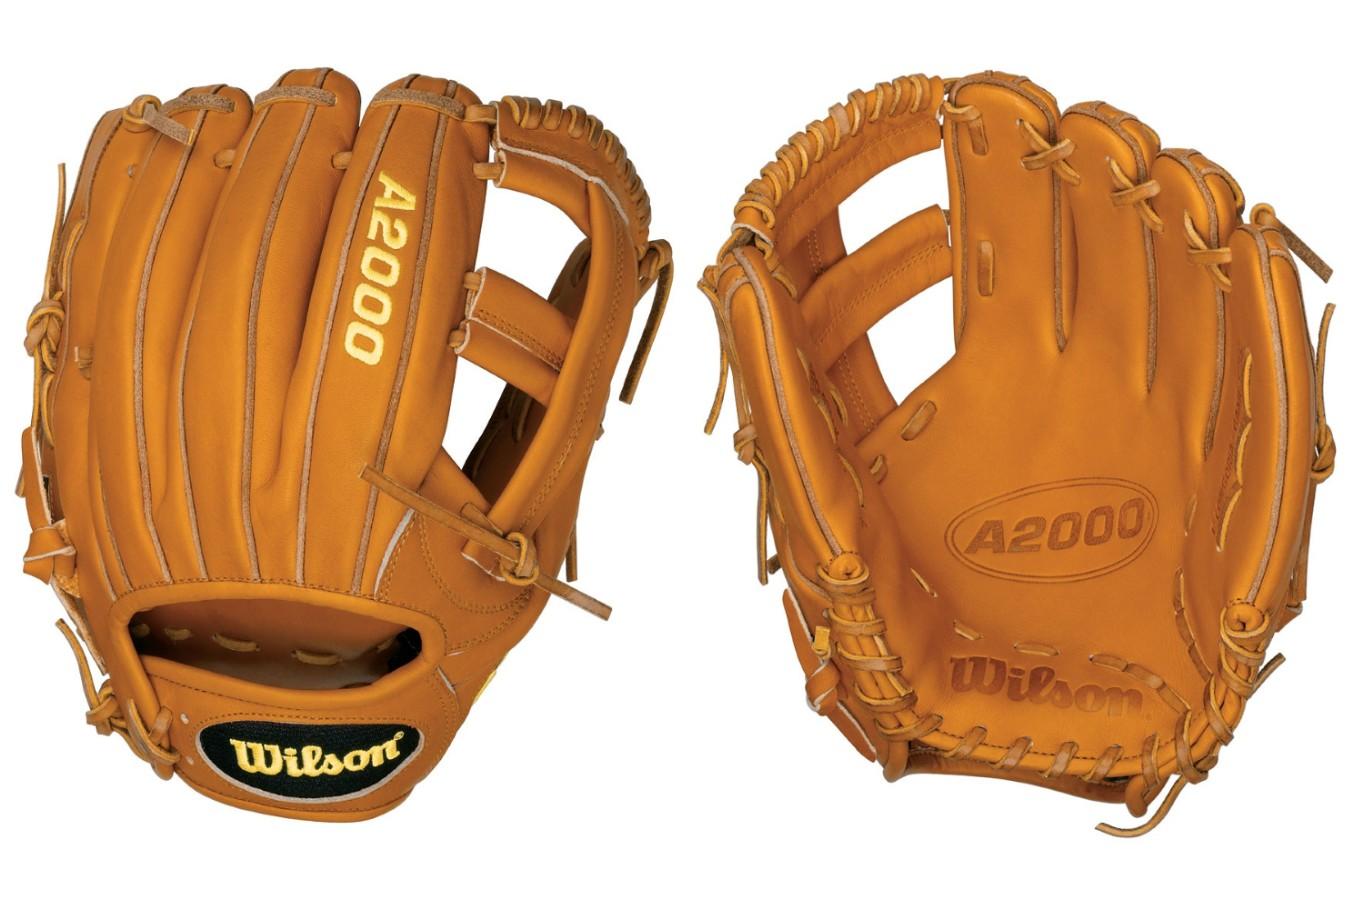 Evan Longoria's Glove: Orange Tan Wilson A2000 EL3